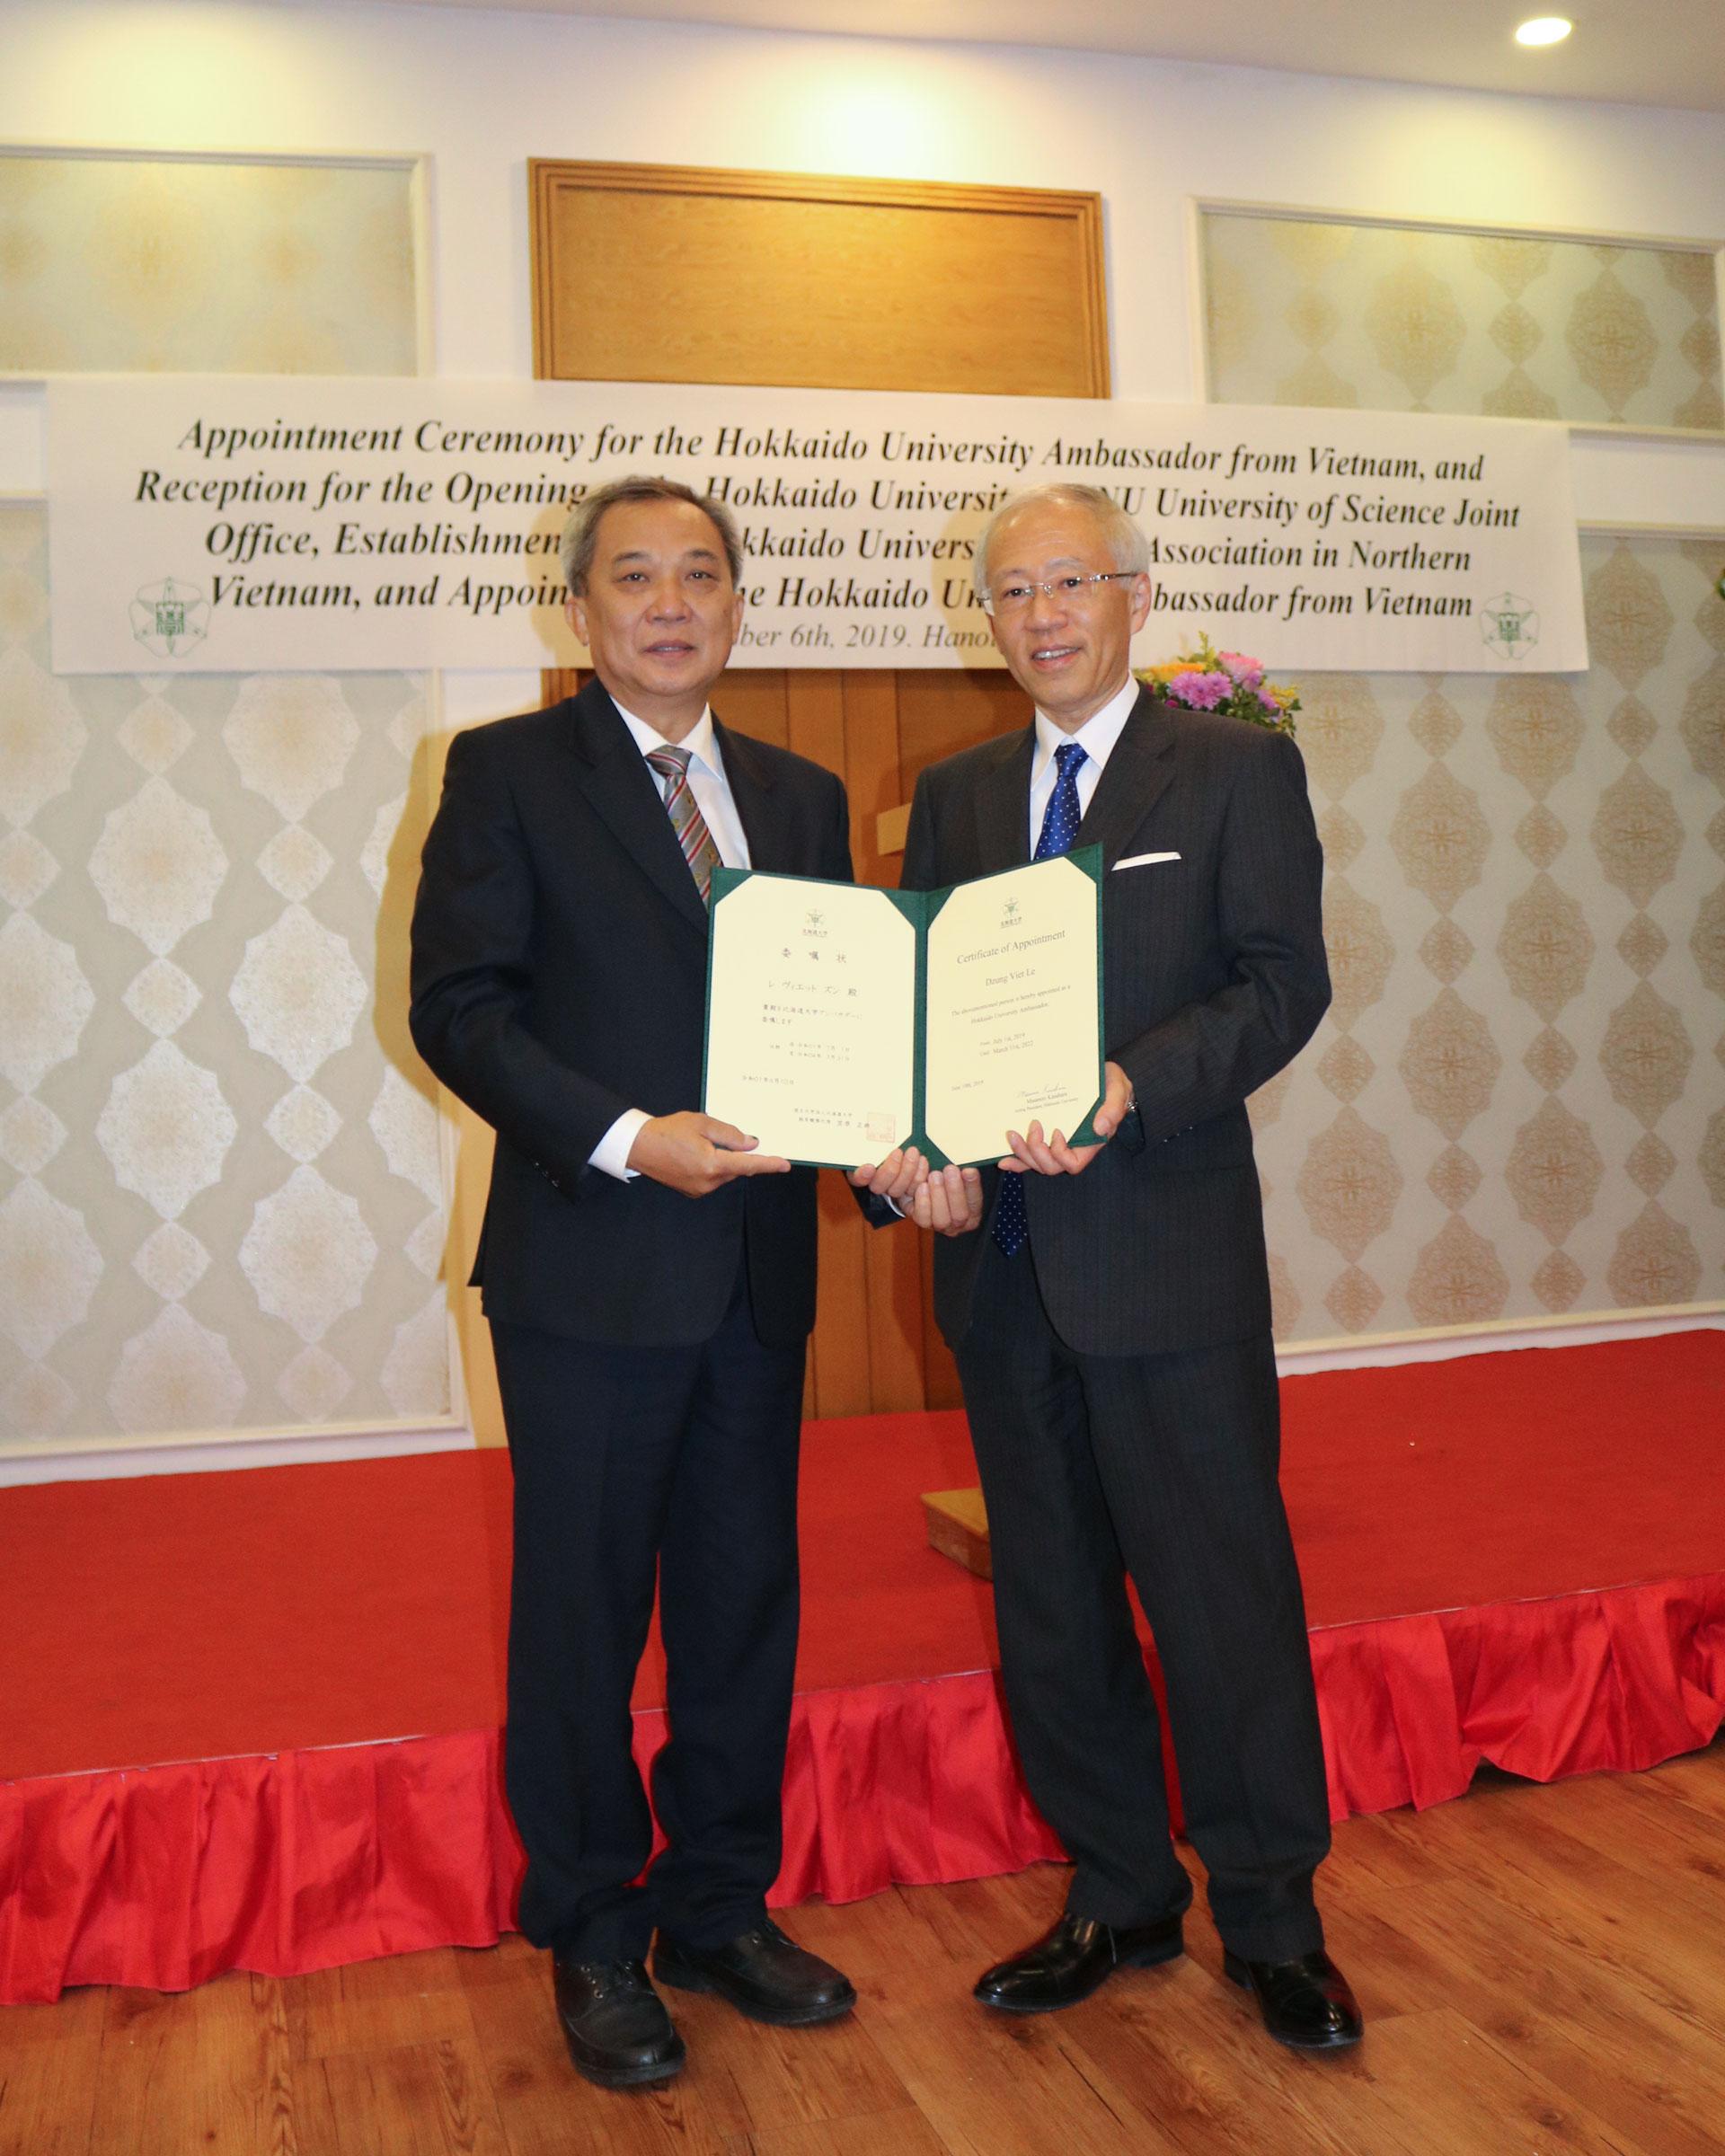 Associate Professor Le Viet Dzung receiving his Hokkaido University Ambassador certificate